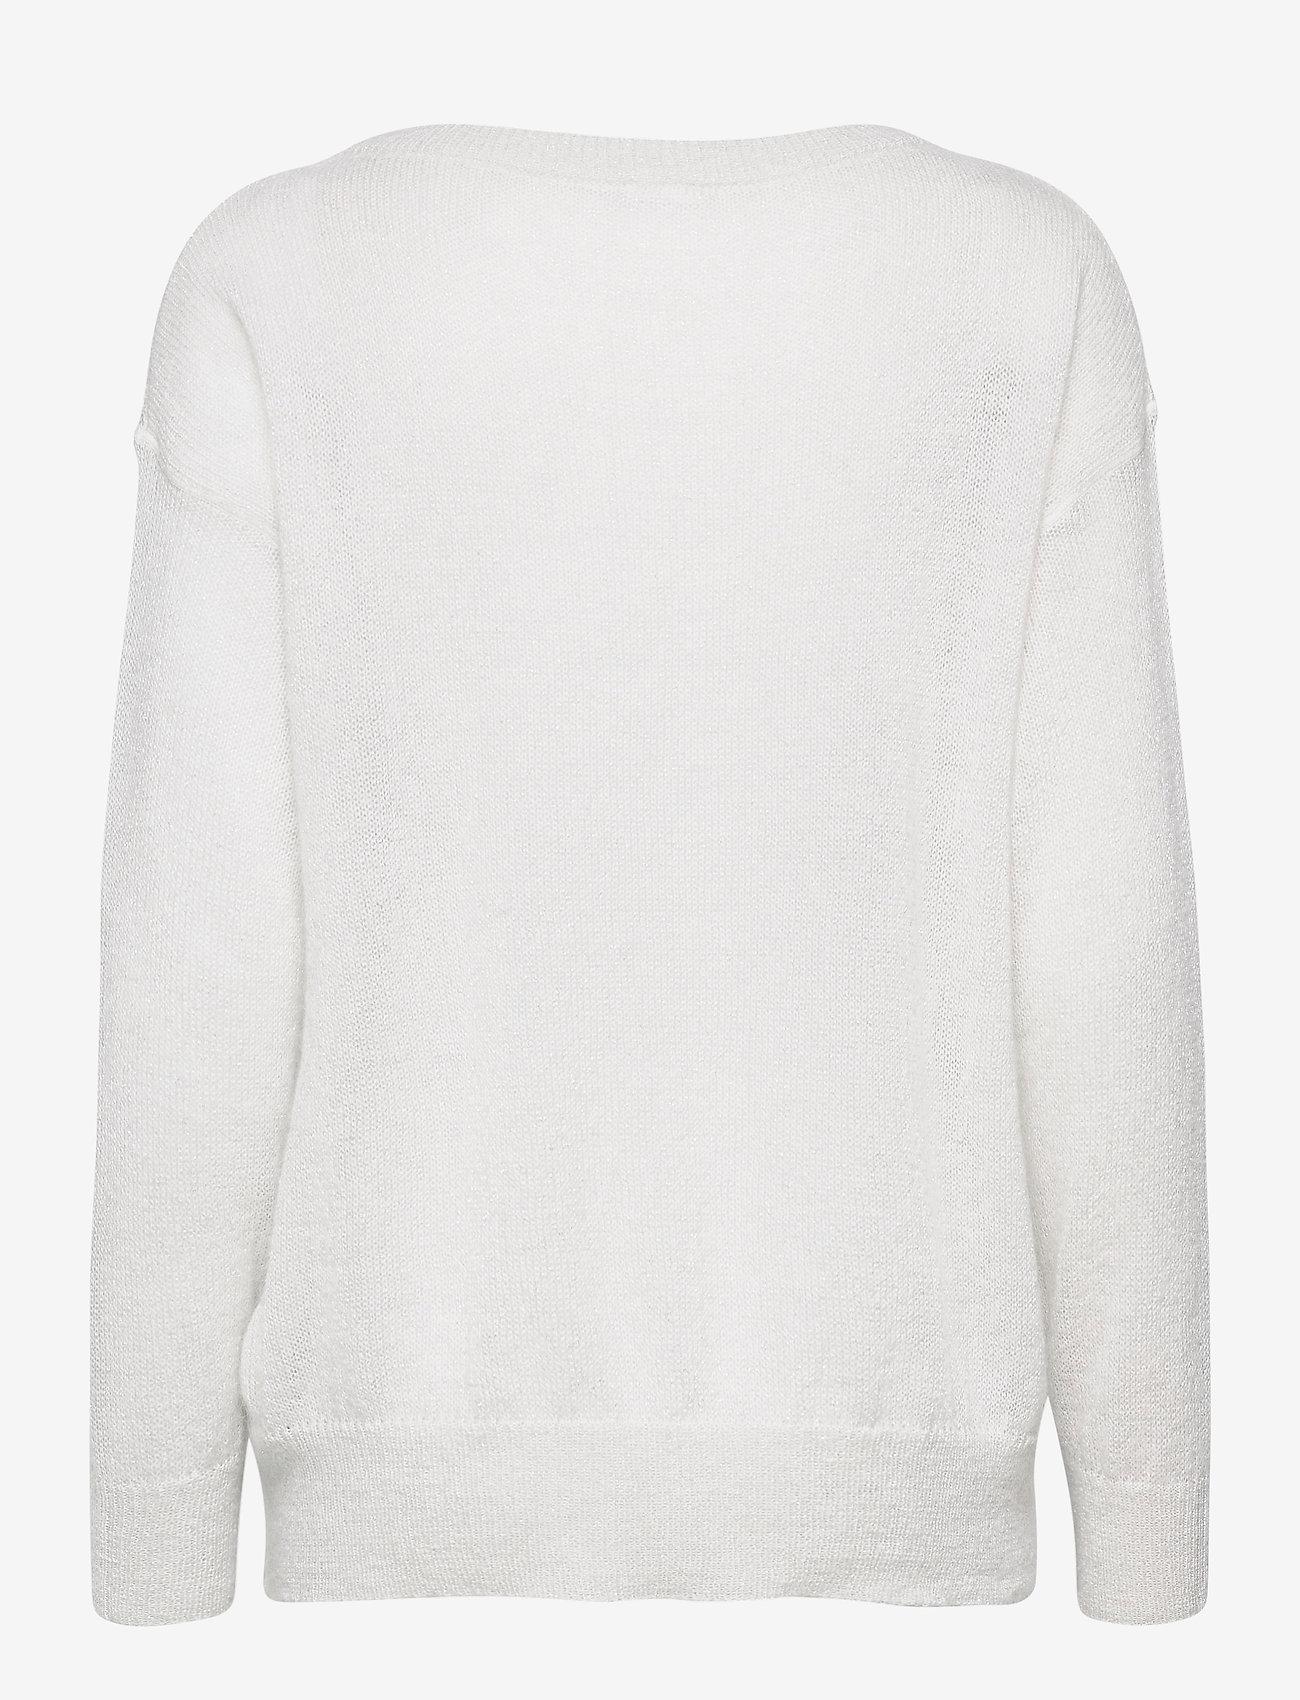 Max Mara Leisure - PILADE - sweaters - white - 1